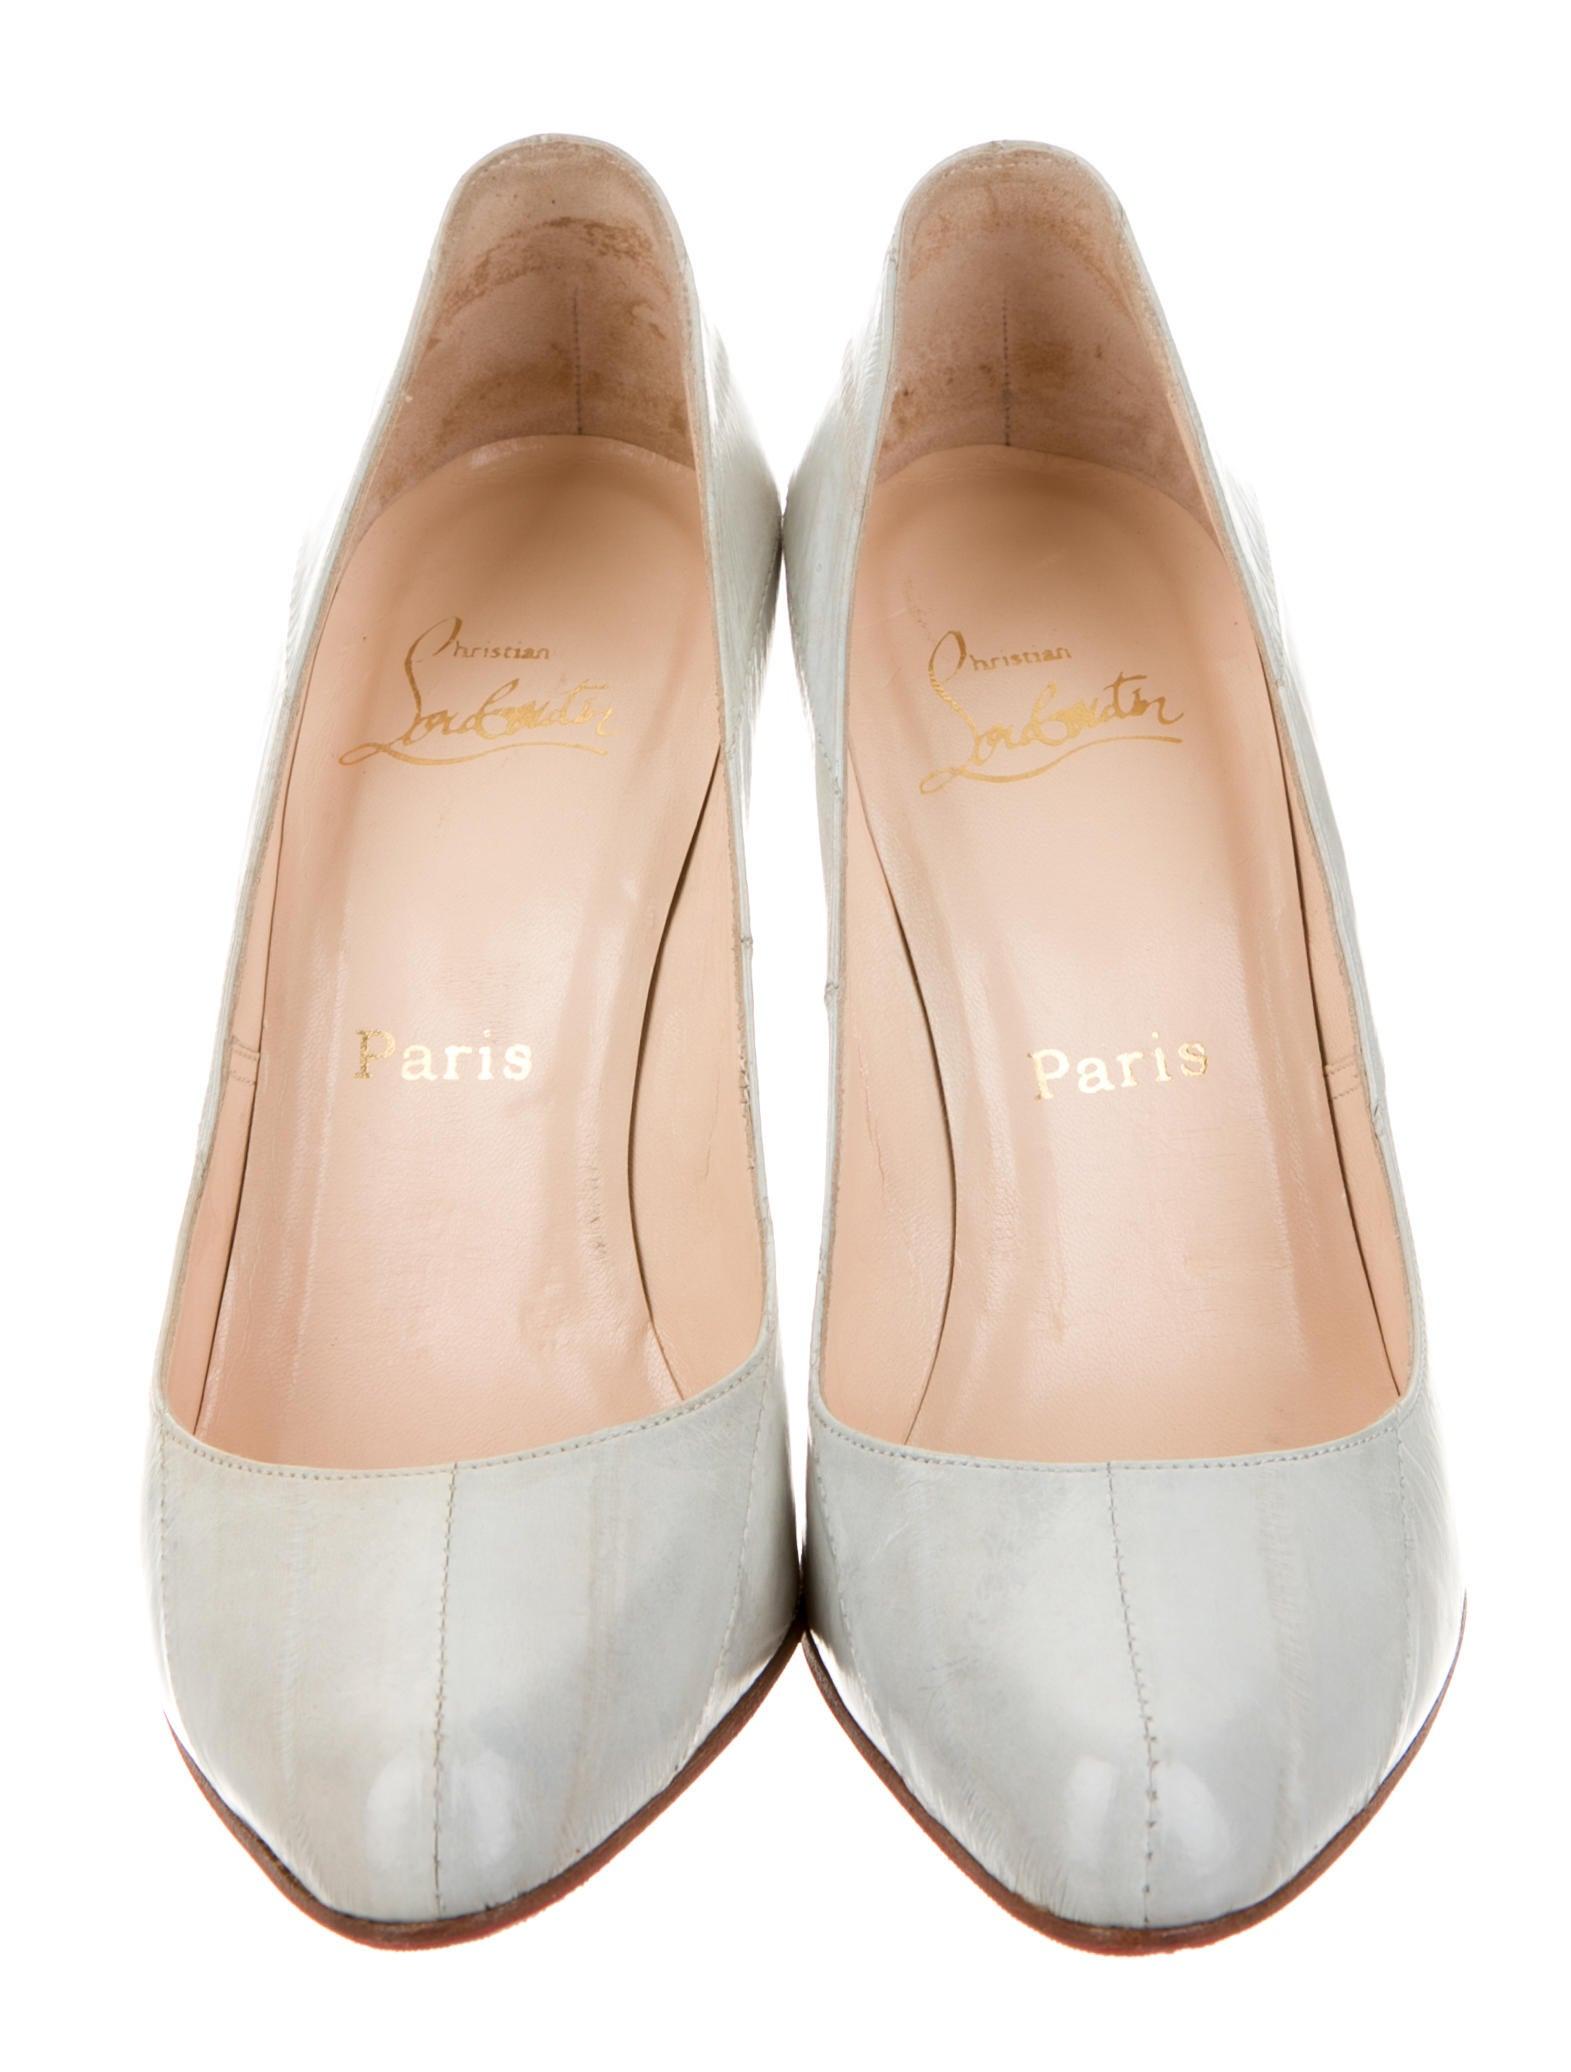 louboutin loafer - Christian Louboutin Eel Skin Decollete 868 Pumps - Shoes ...